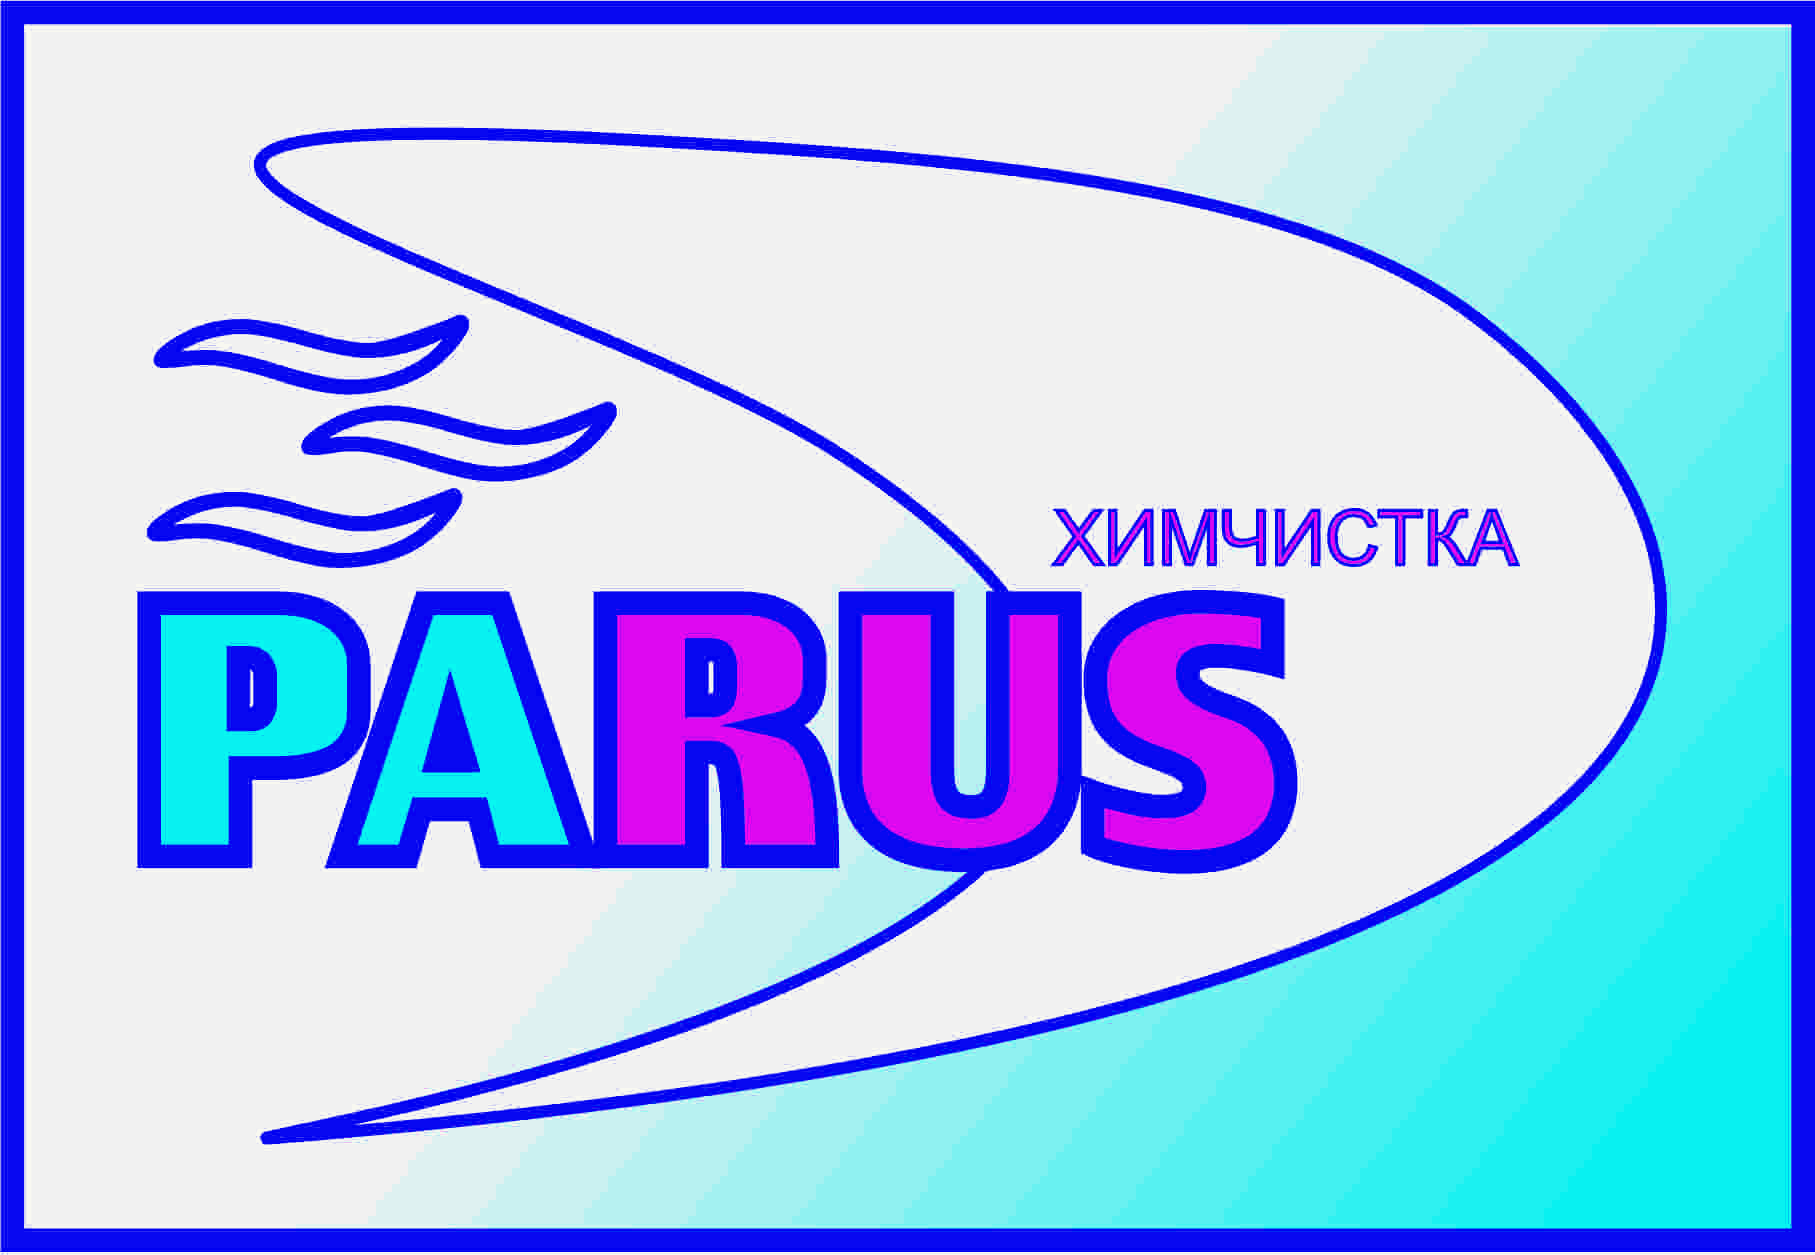 Название и логотип для прачечной/химчистки фото f_37558f3440acd98f.jpg